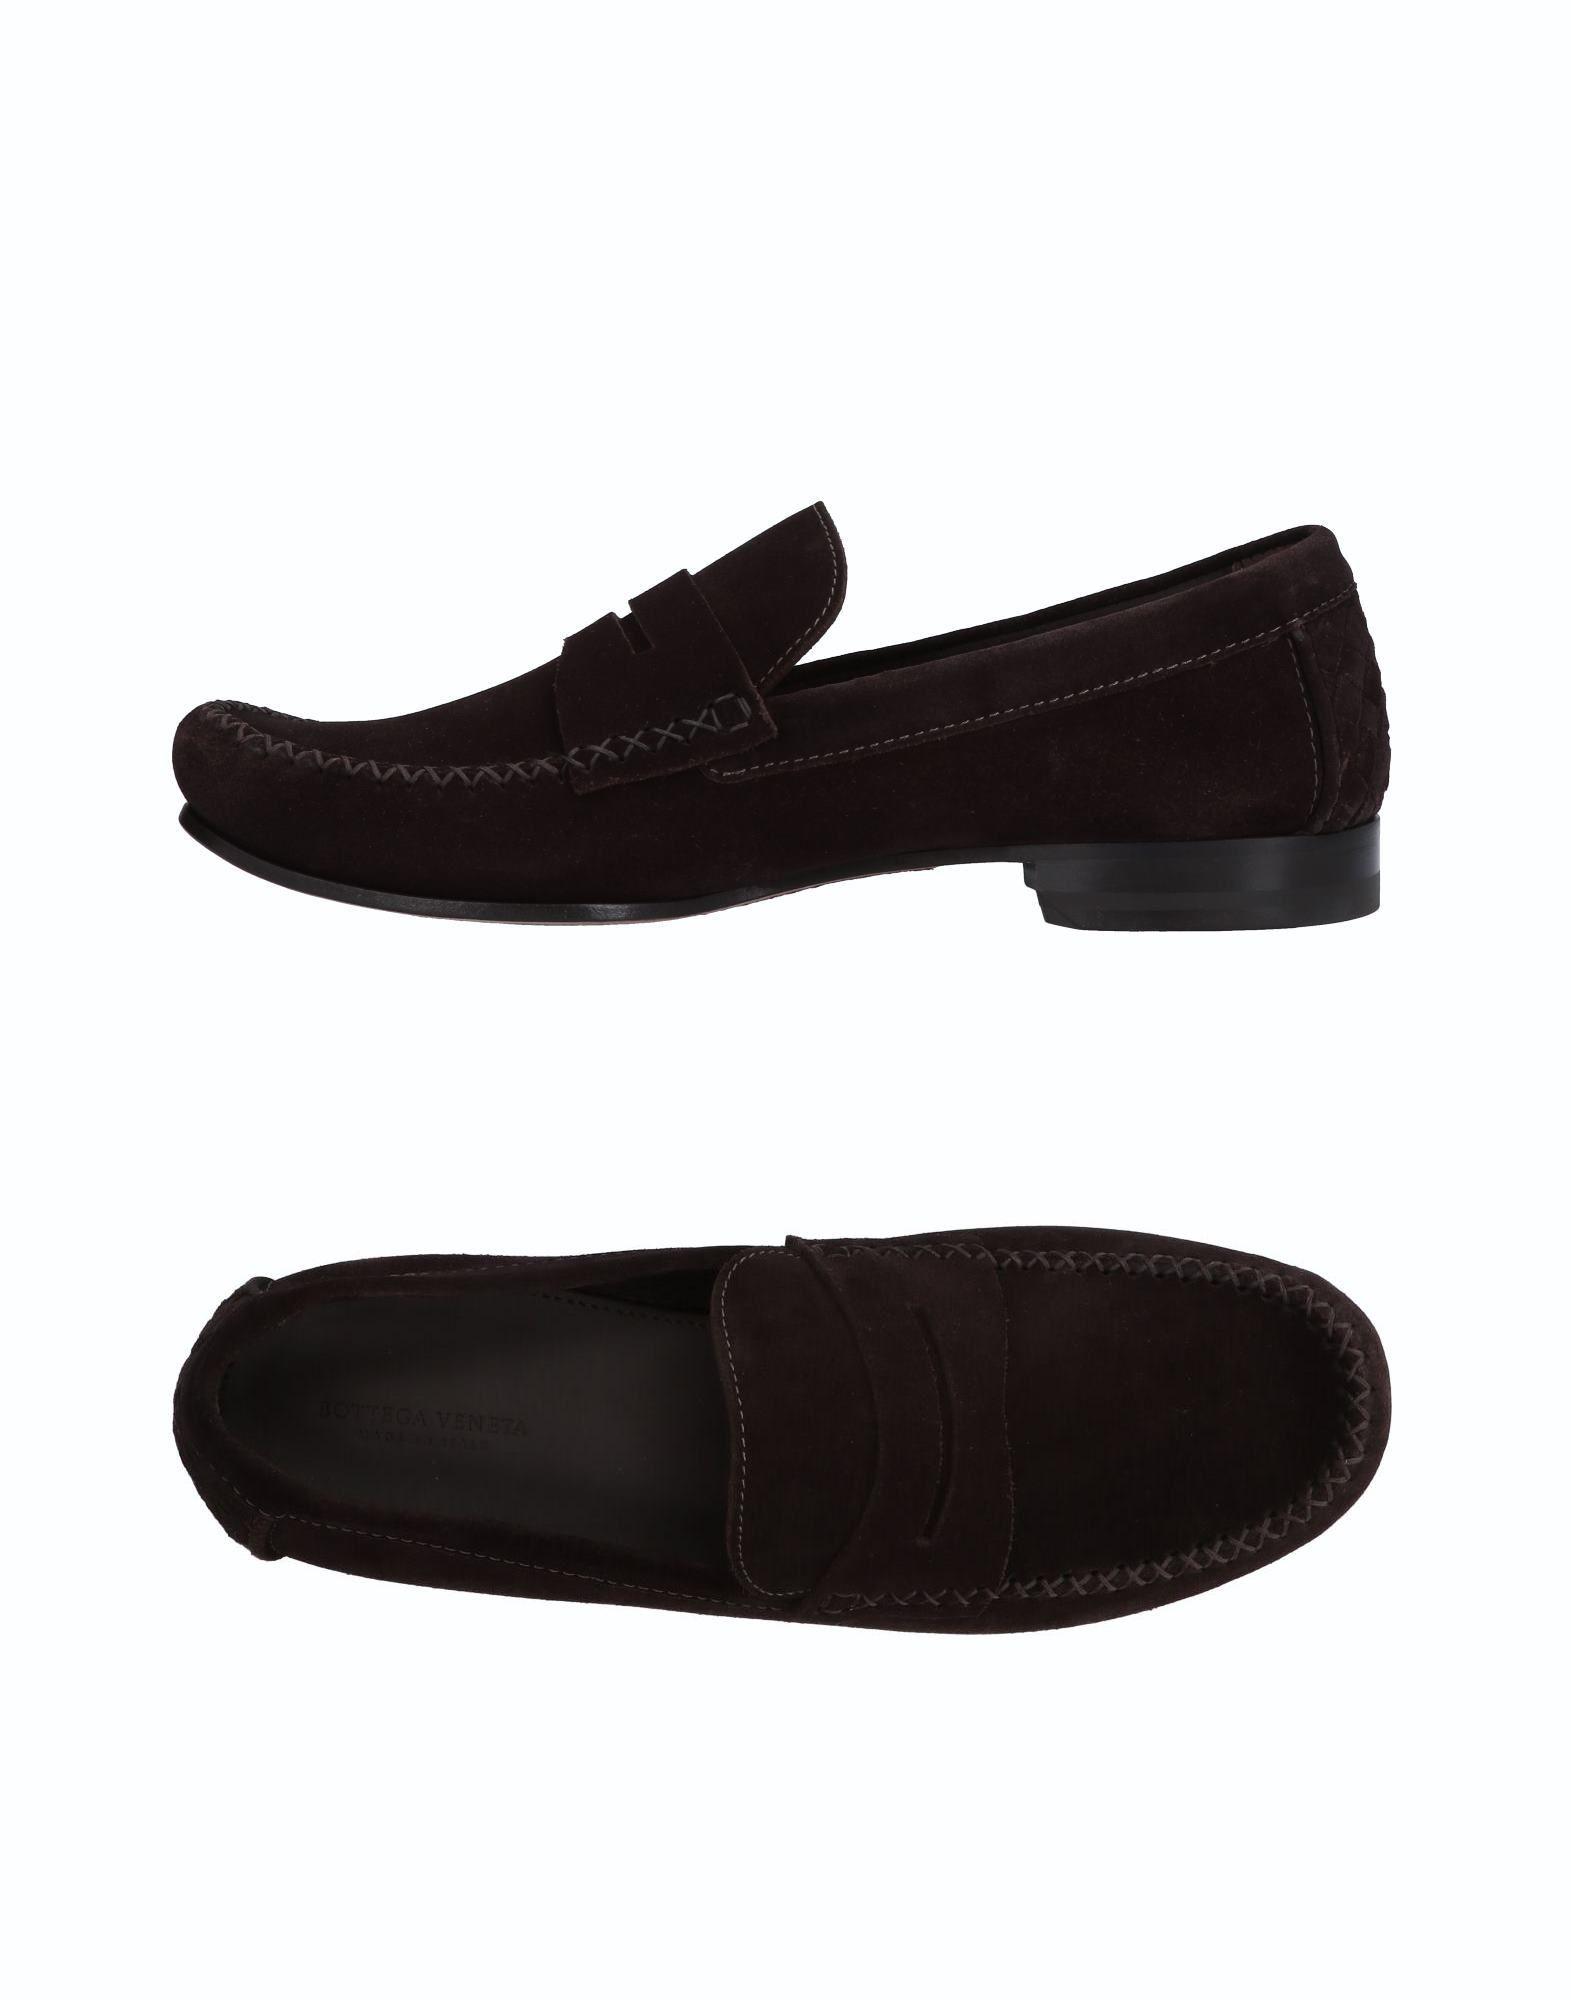 Bottega Veneta Mokassins Herren  11499832DB Gute Qualität beliebte Schuhe